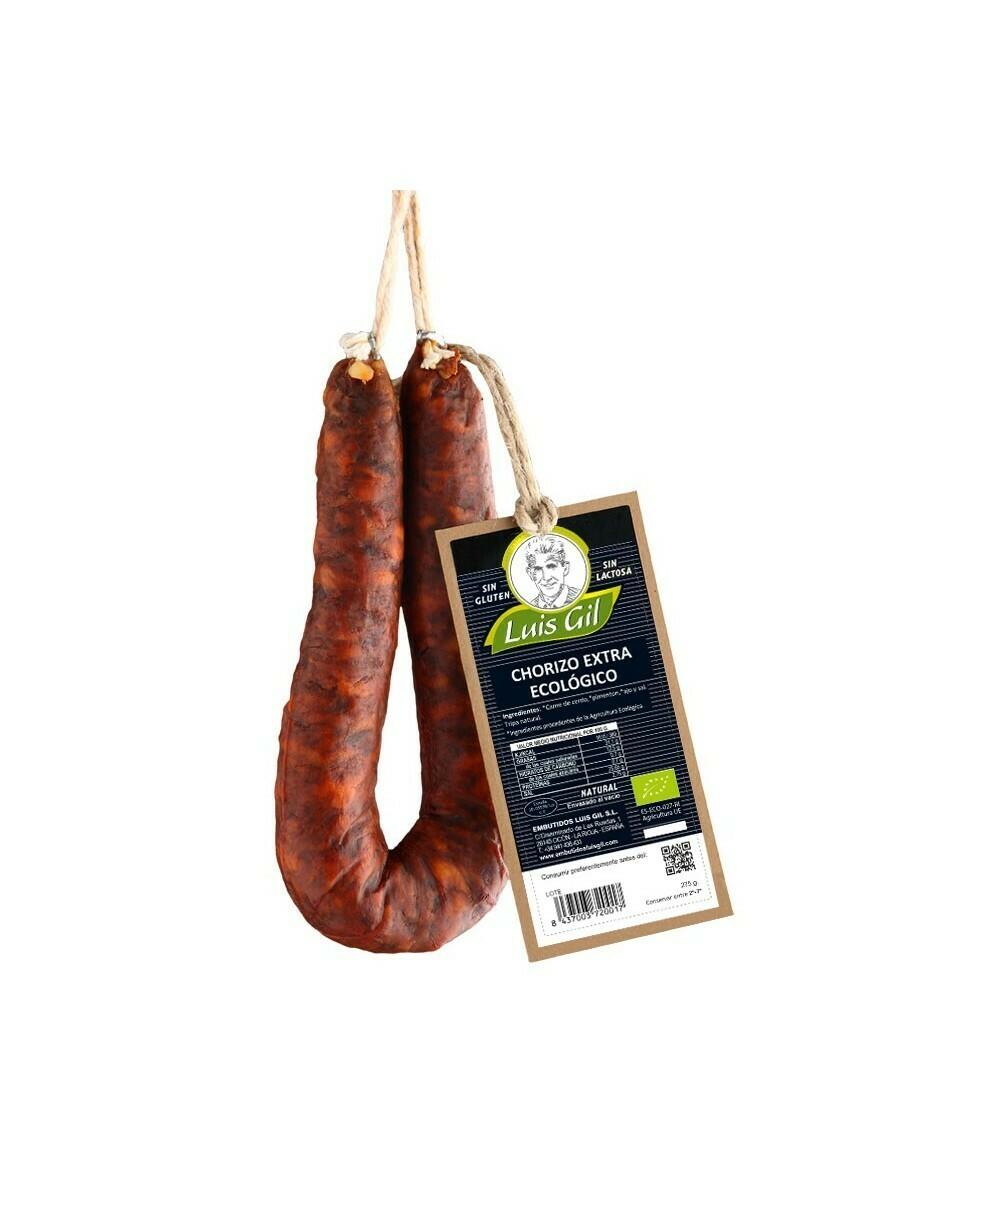 Biologische Chorizo extra eco 280 gram